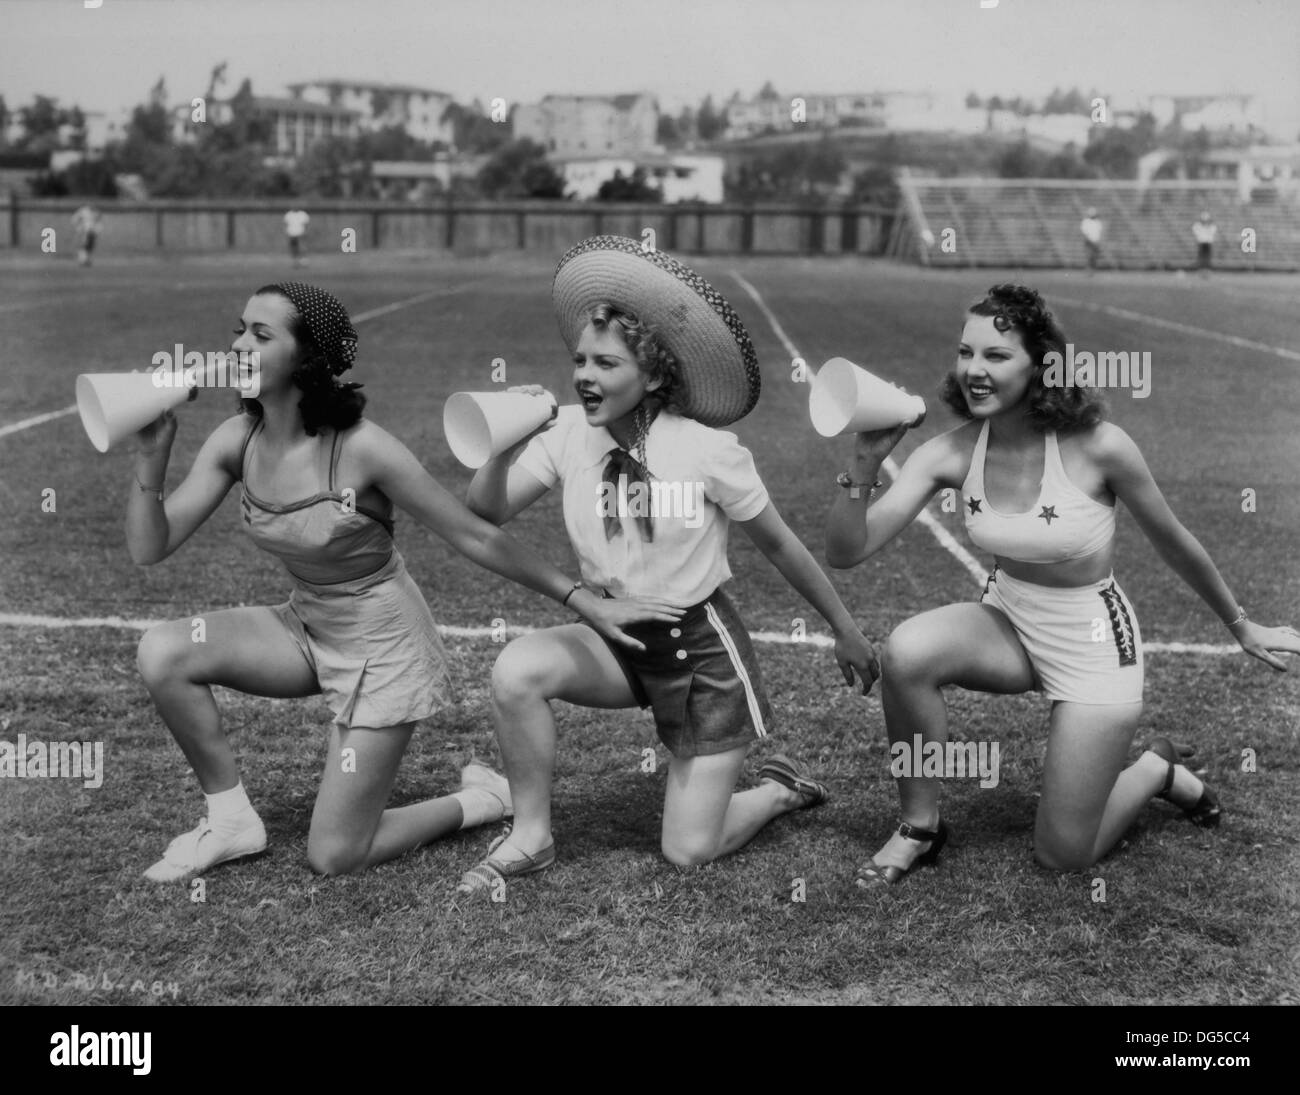 Natalie Moorhead,Judi Meredith Hot nude Dudley Moore (1935?002),Dave Legeno (1963?014)